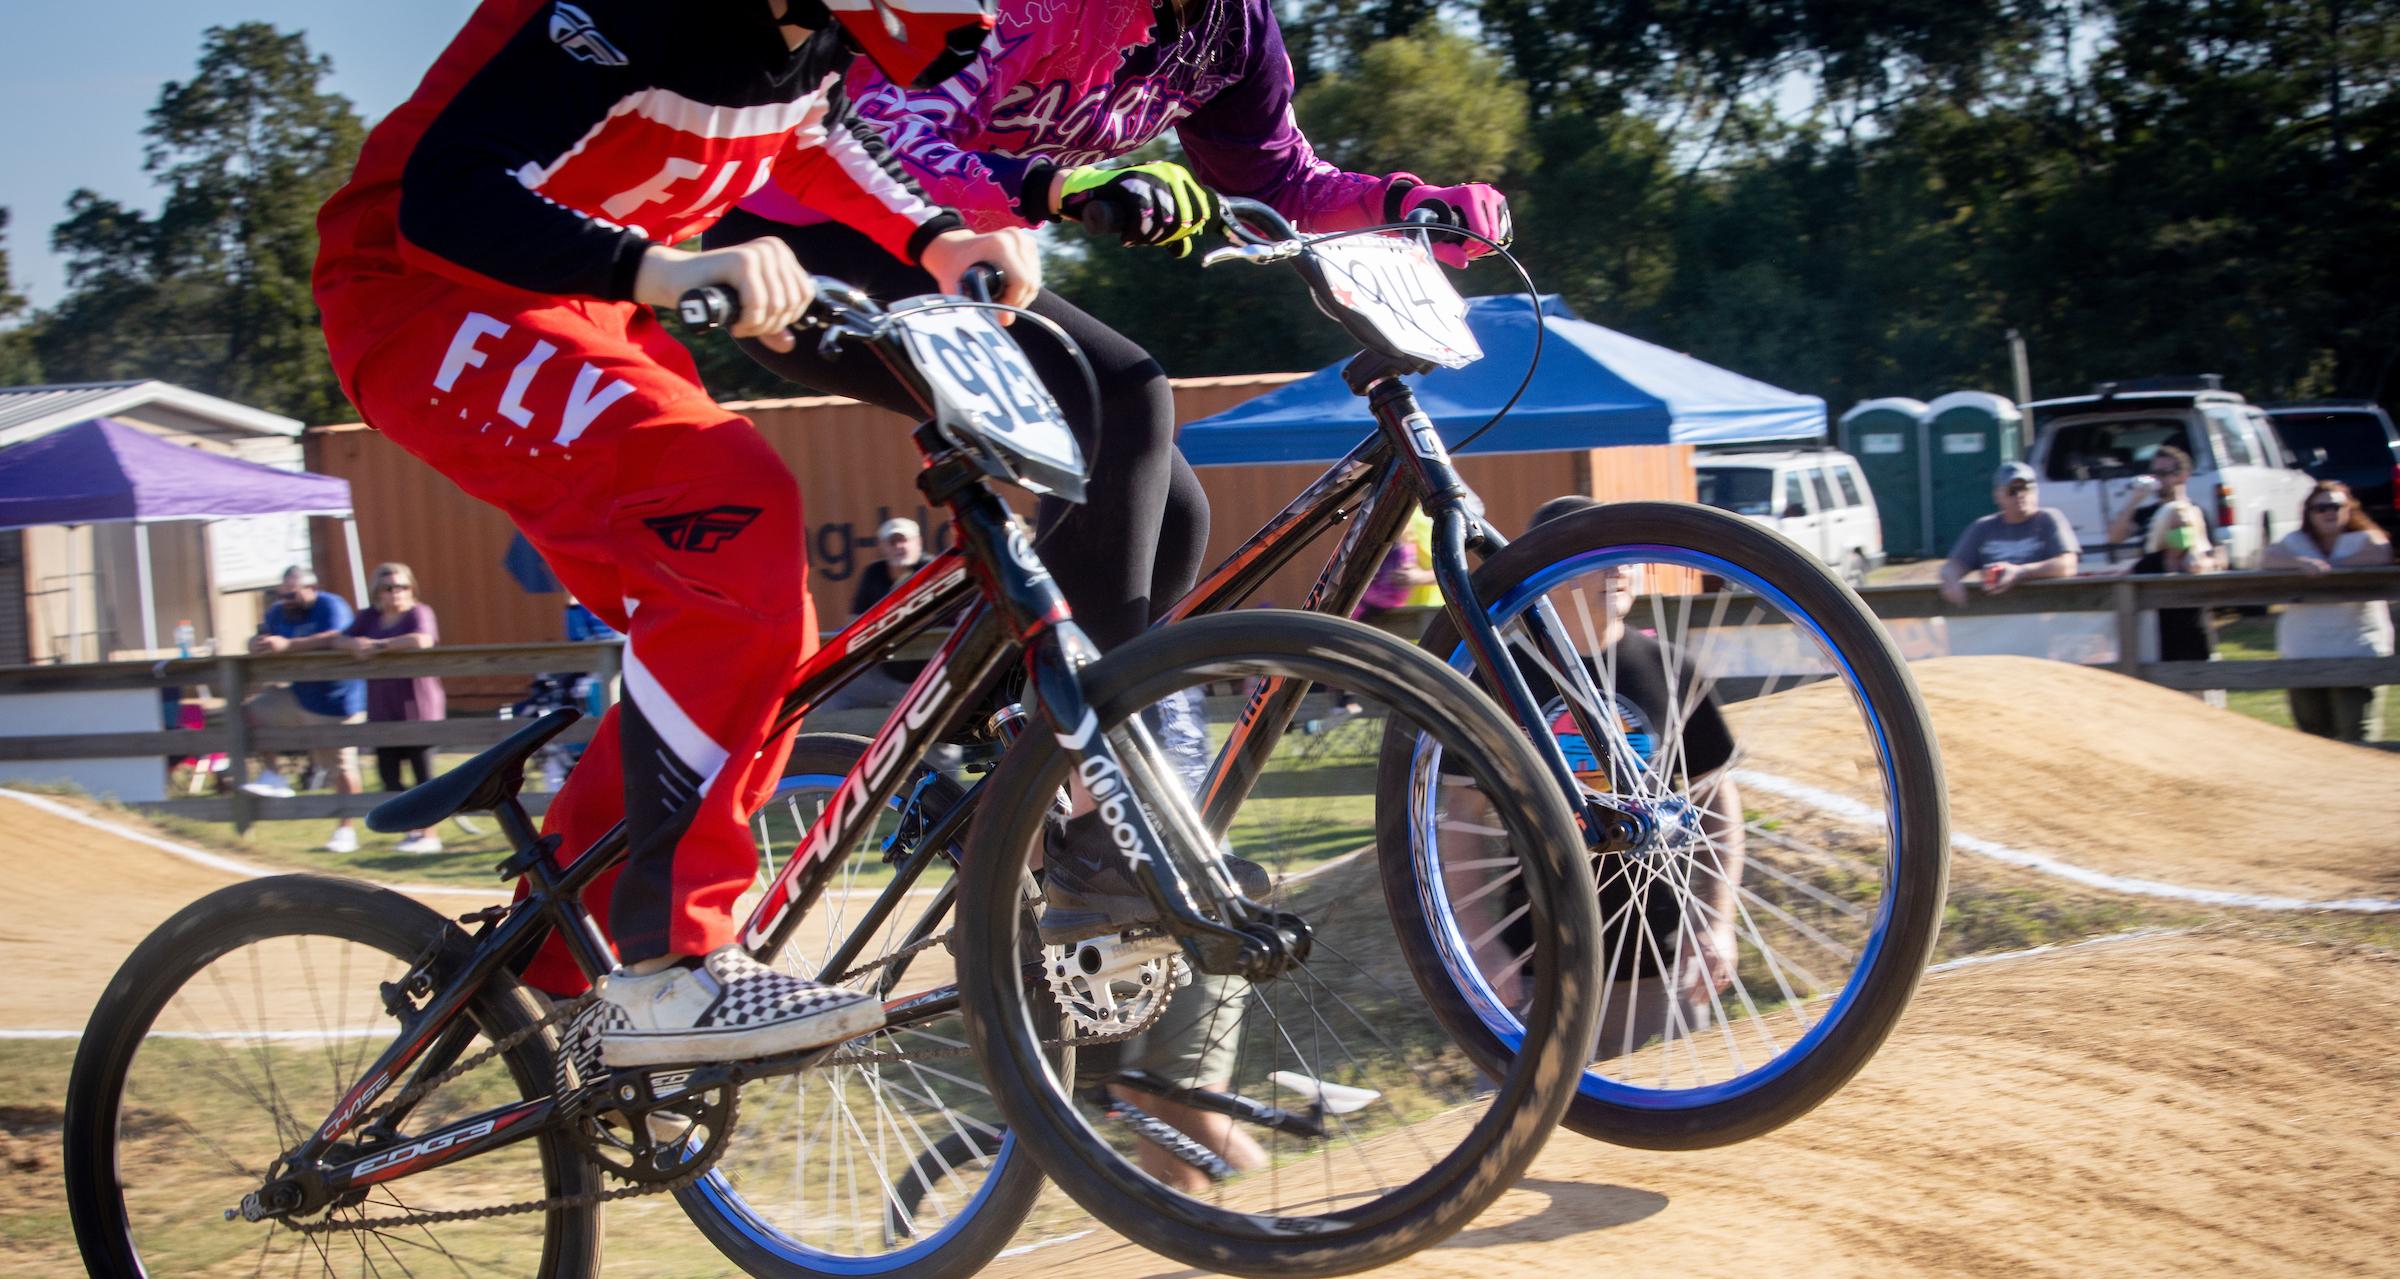 BMX Bicycle Racing- Ridgeland, MS